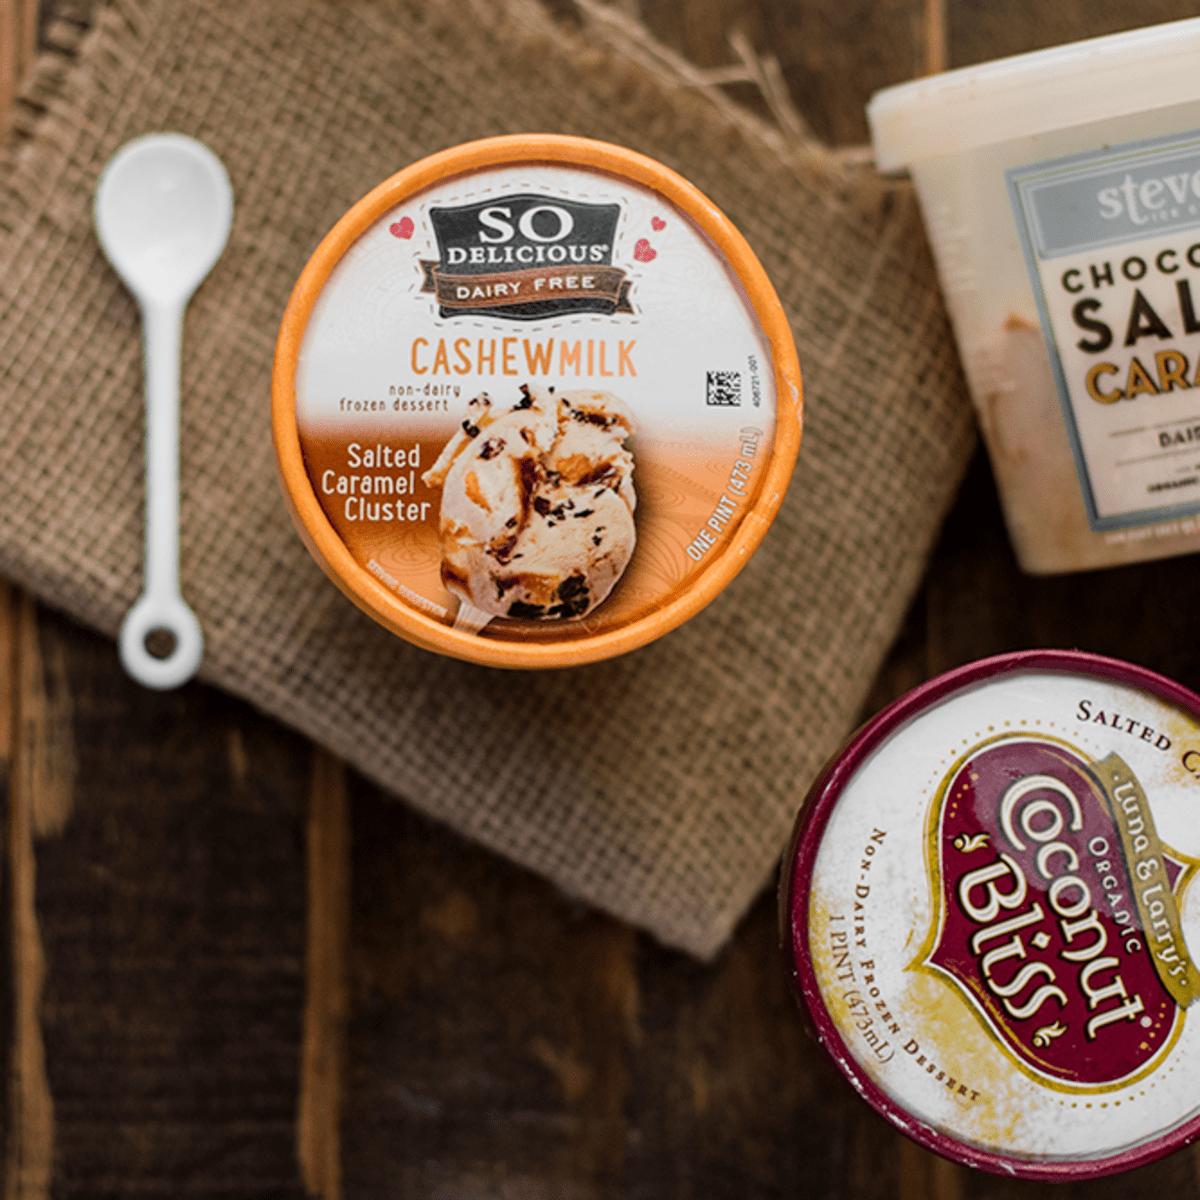 5 Vegan Ice Cream Brands Put To The Ultimate Taste Test Organic Authority